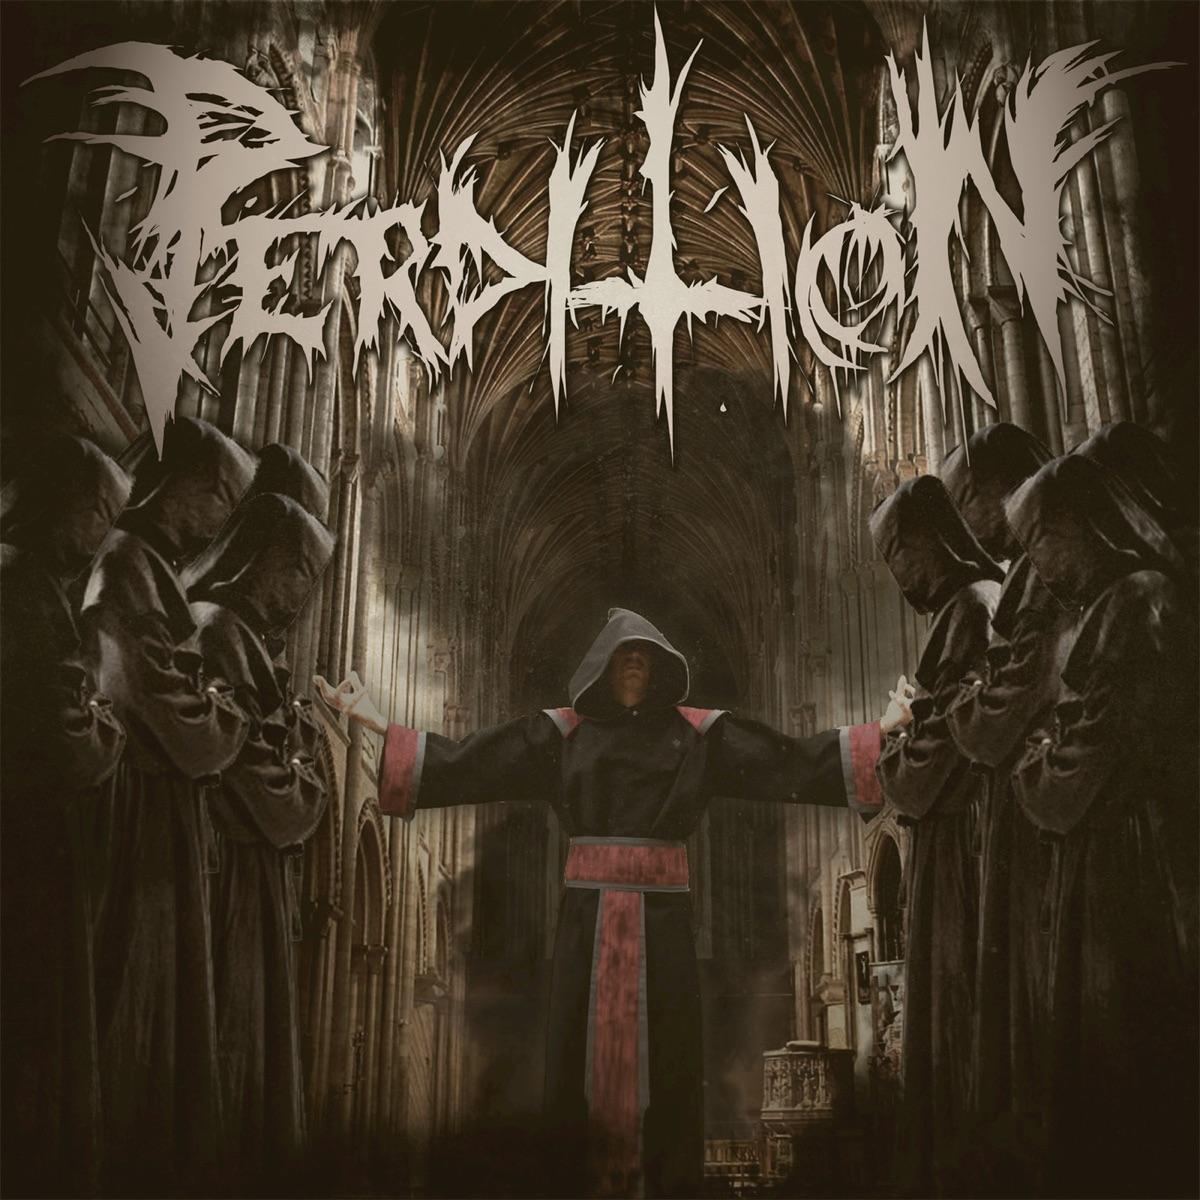 Perdition Deluxe Edition Perdition CD cover